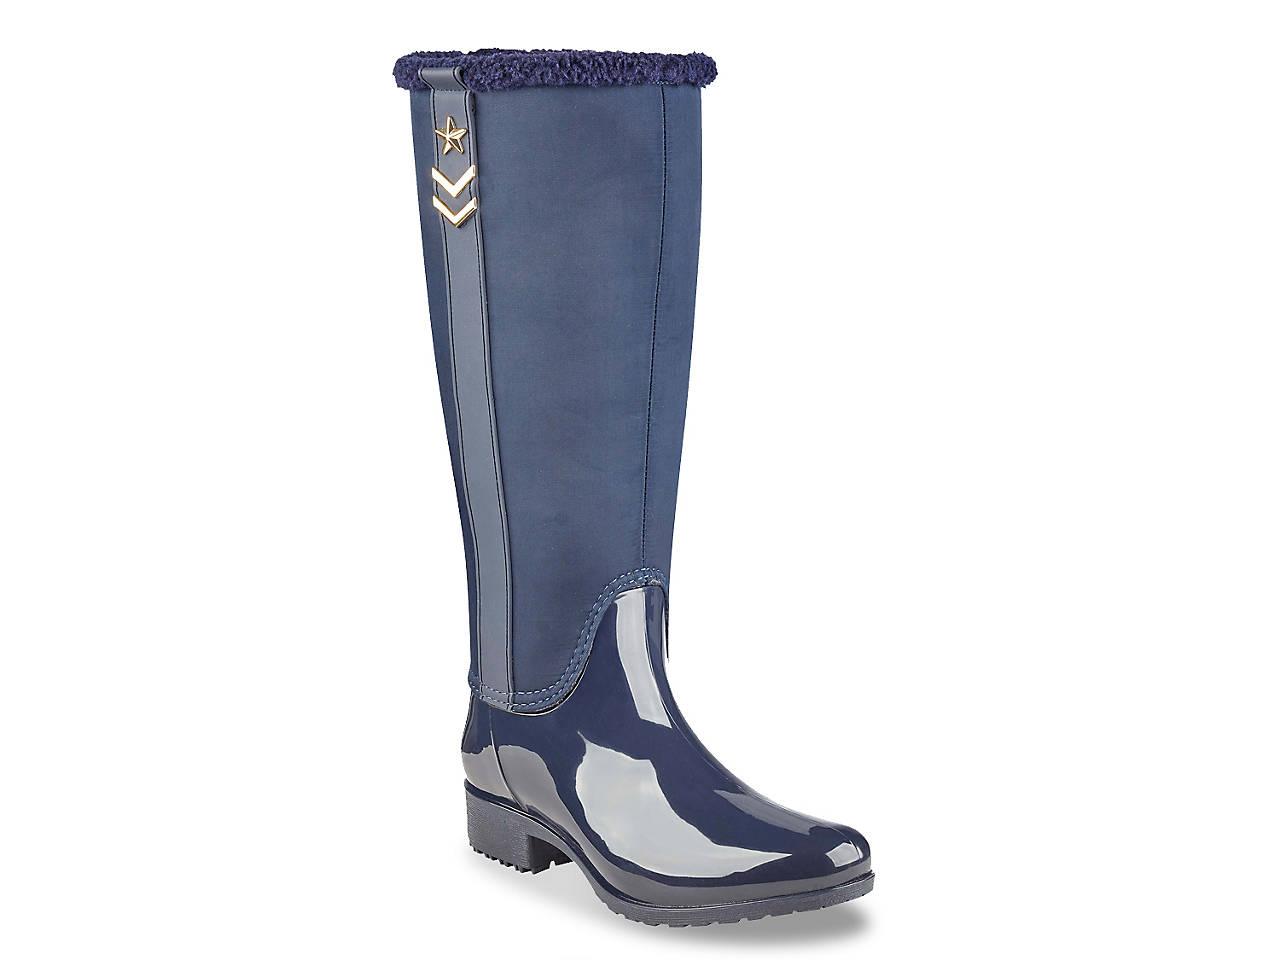 12f613288 Tommy Hilfiger Four2 Rain Boot Women s Shoes